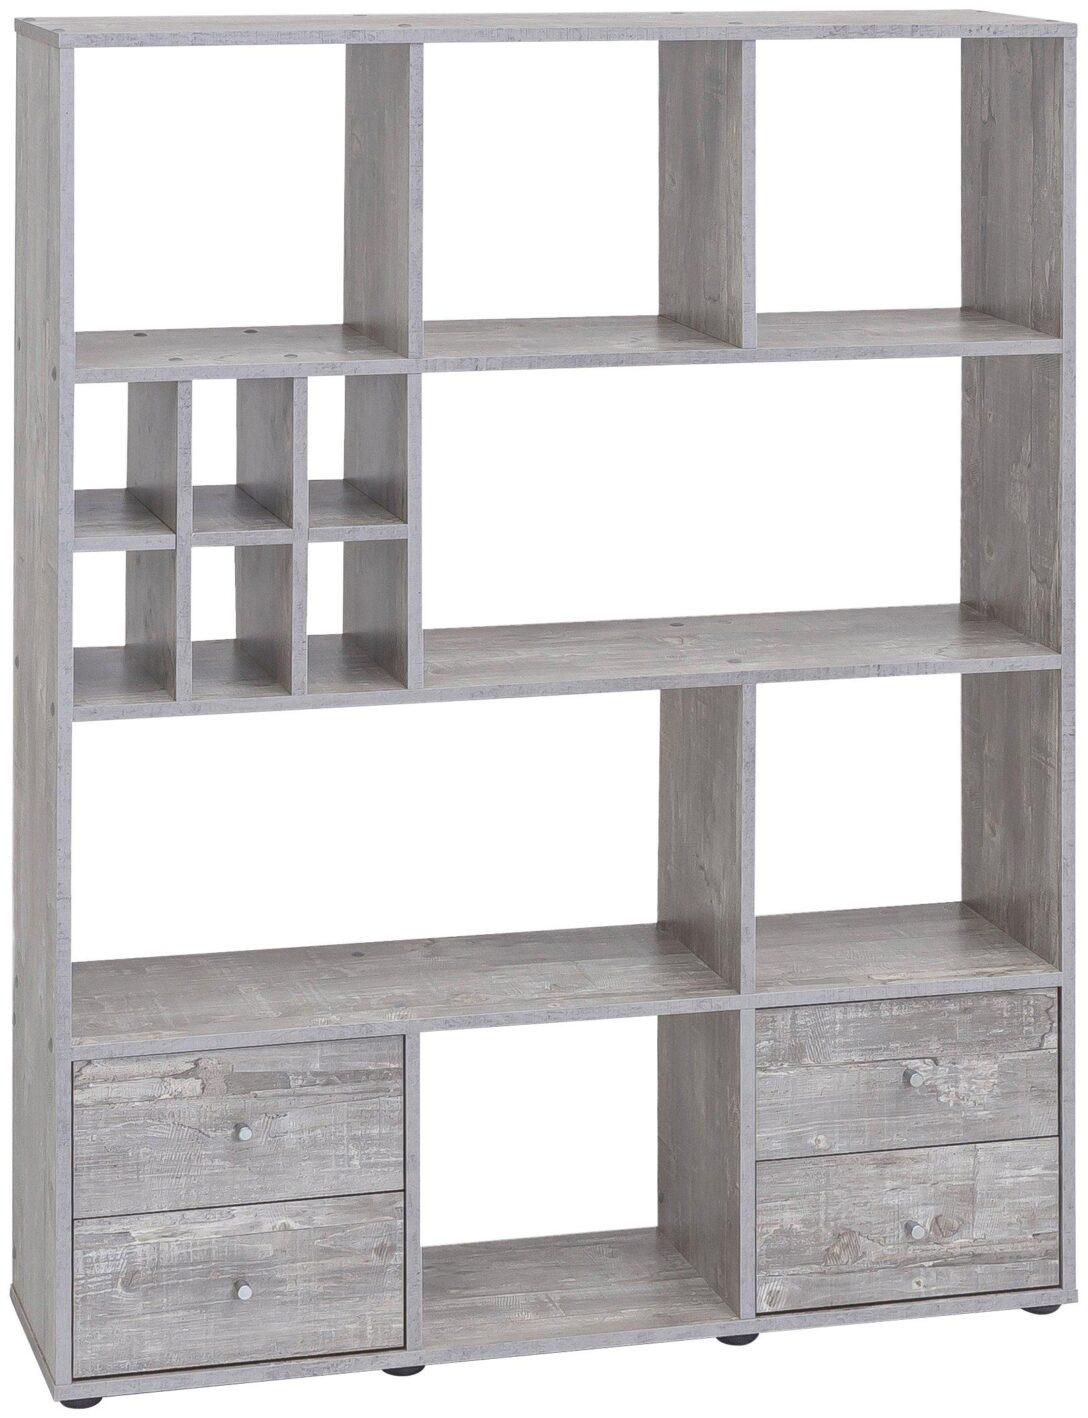 Full Size of Raumteiler Ikea Raumtrenner Regal Selbst Bauen Ideen Holz Metall Selber Küche Kosten Sofa Mit Schlaffunktion Miniküche Betten 160x200 Kaufen Bei Modulküche Wohnzimmer Raumteiler Ikea